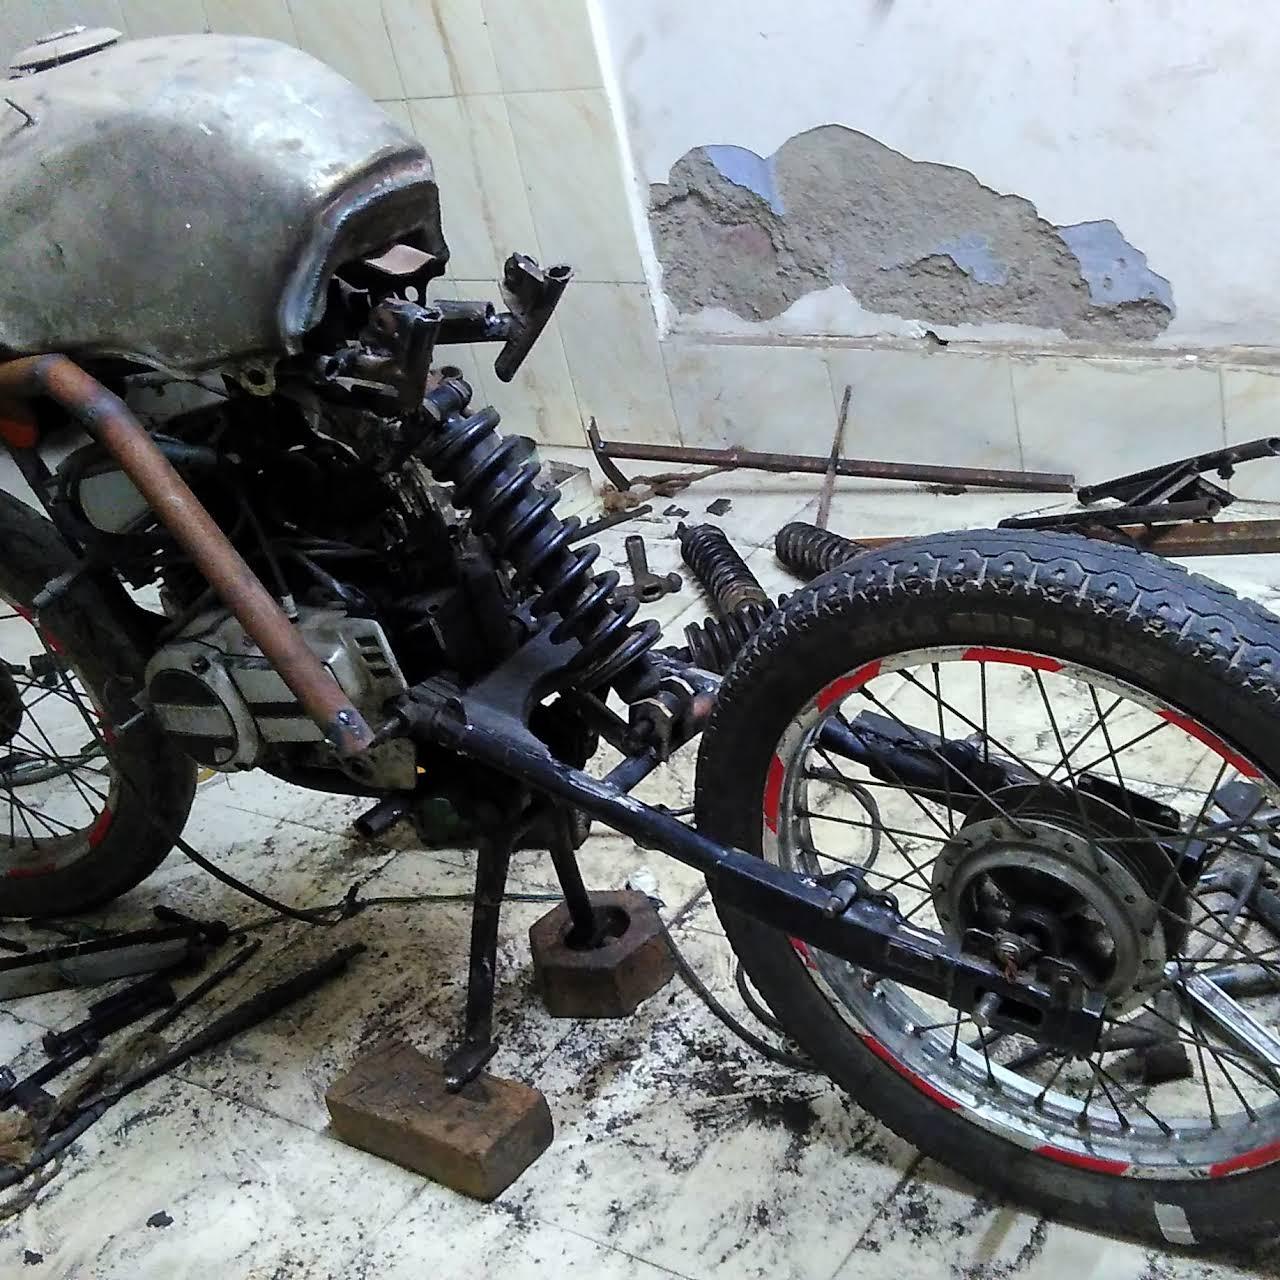 WARN WAR bike modification - Motorbike modification